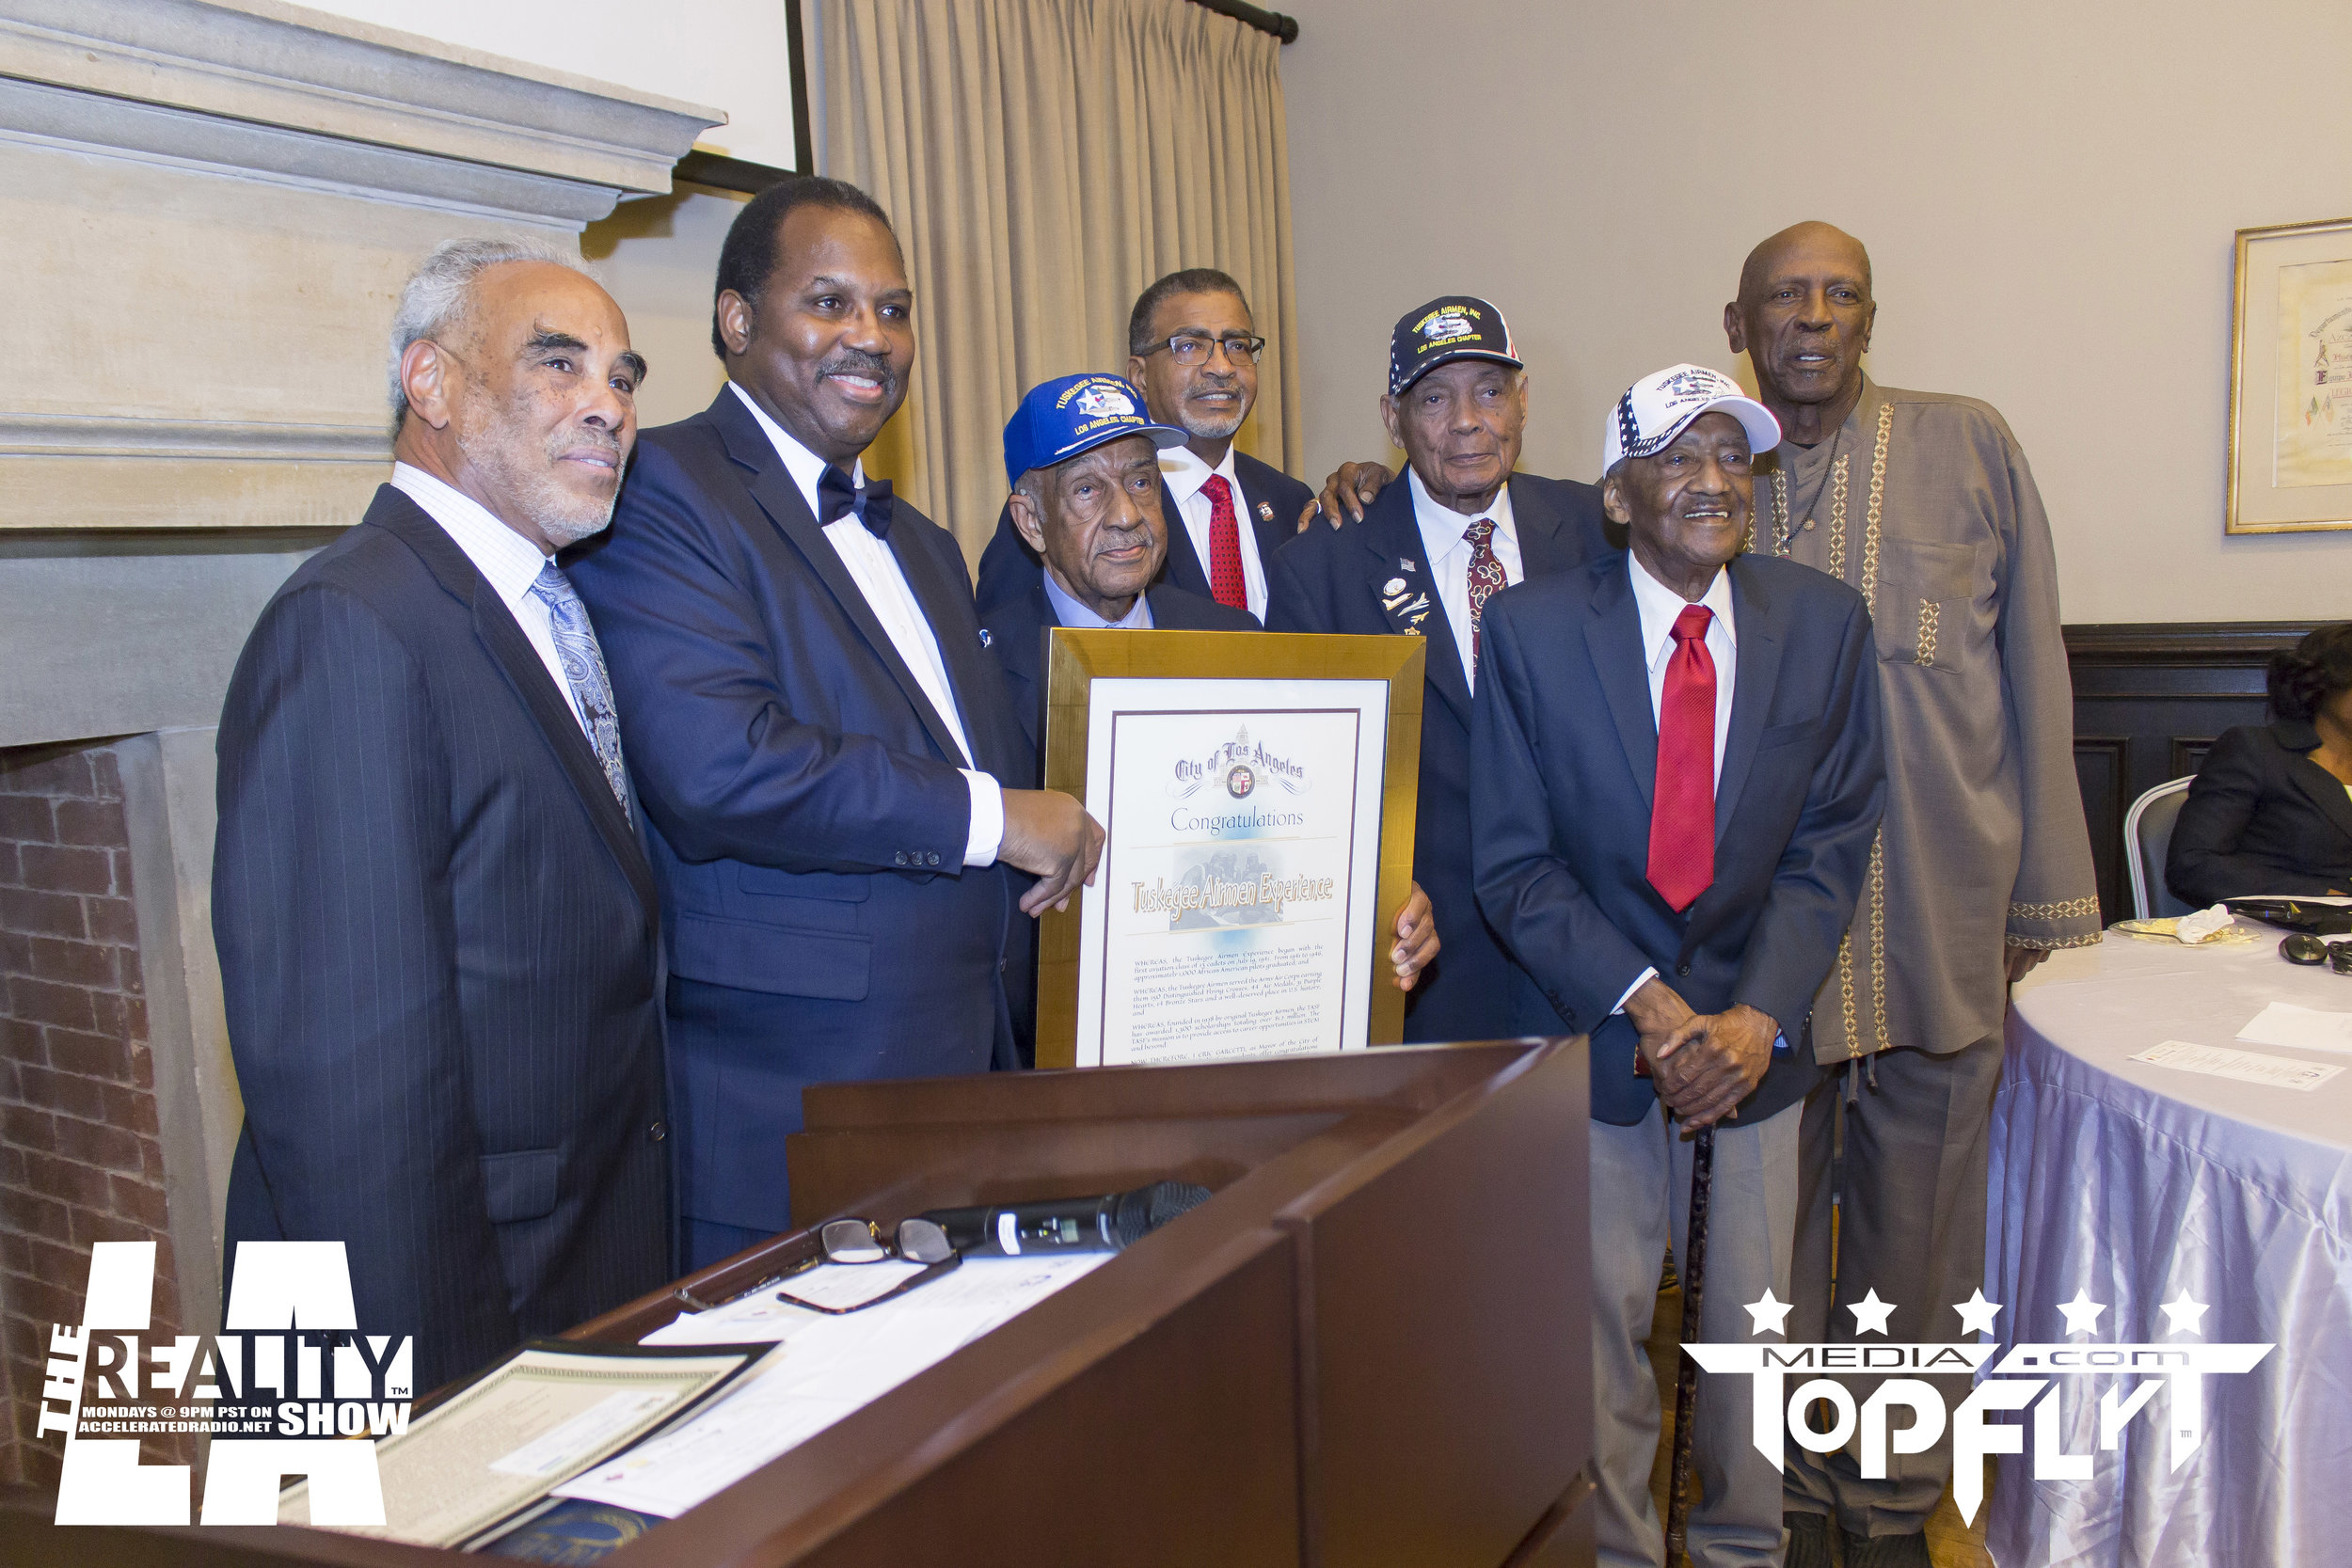 The Reality Show LA - Tuskegee Airmen 75th Anniversary VIP Reception_128.jpg